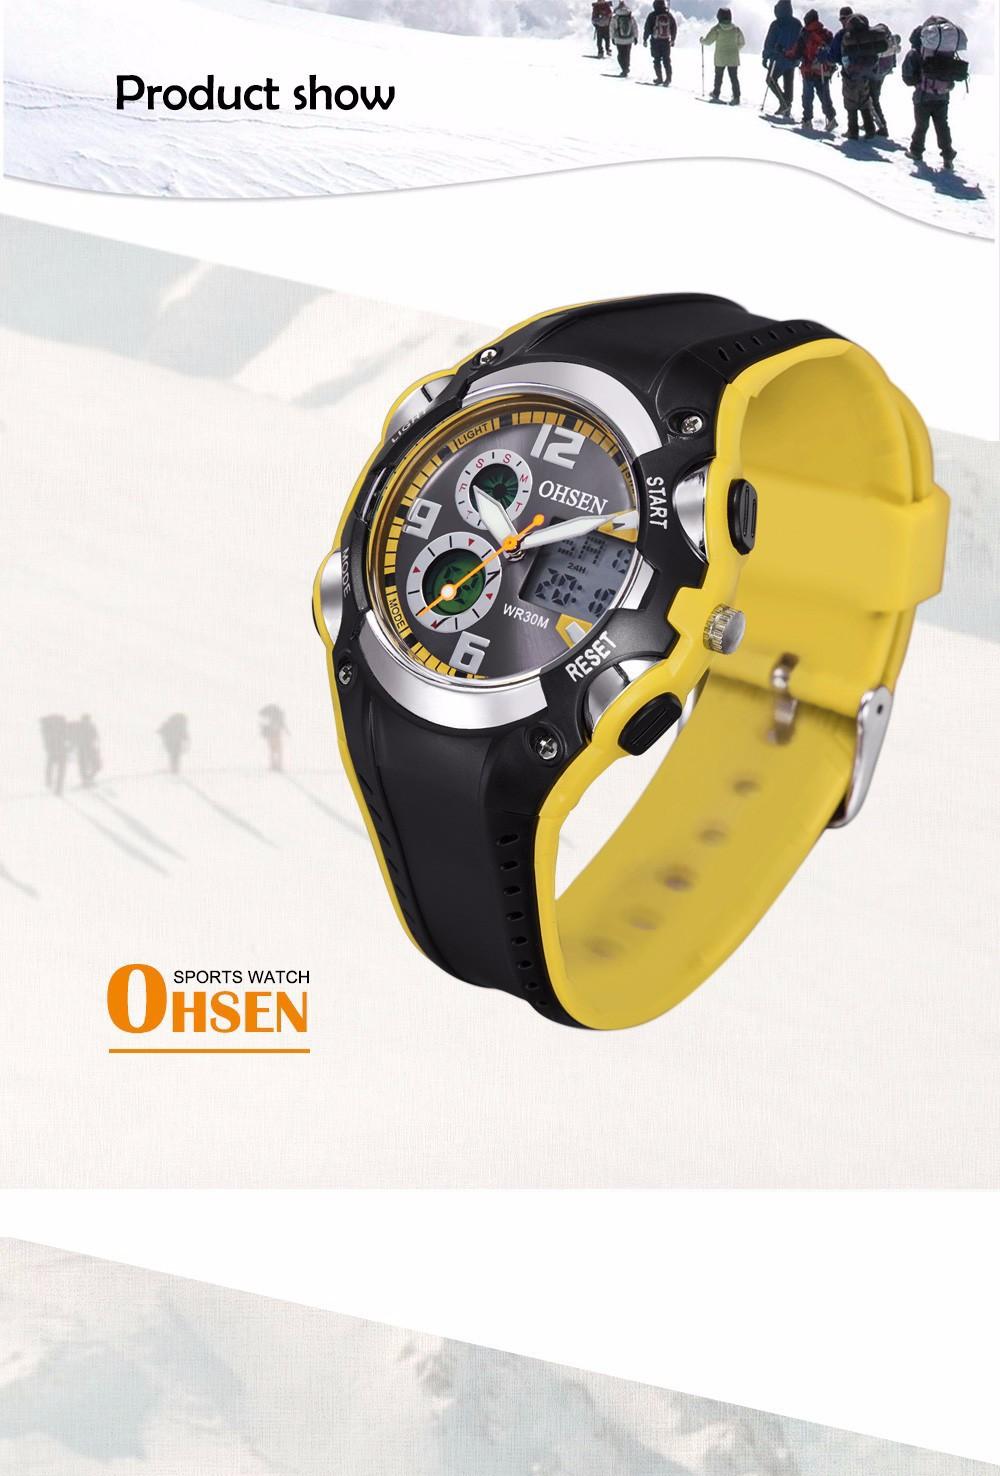 Original Ohsen Brand Fashion Sports Men's Watches 30M Waterproof Rubber Black Rubber Band Digital Sport Wristwatch for Men Gift (17)